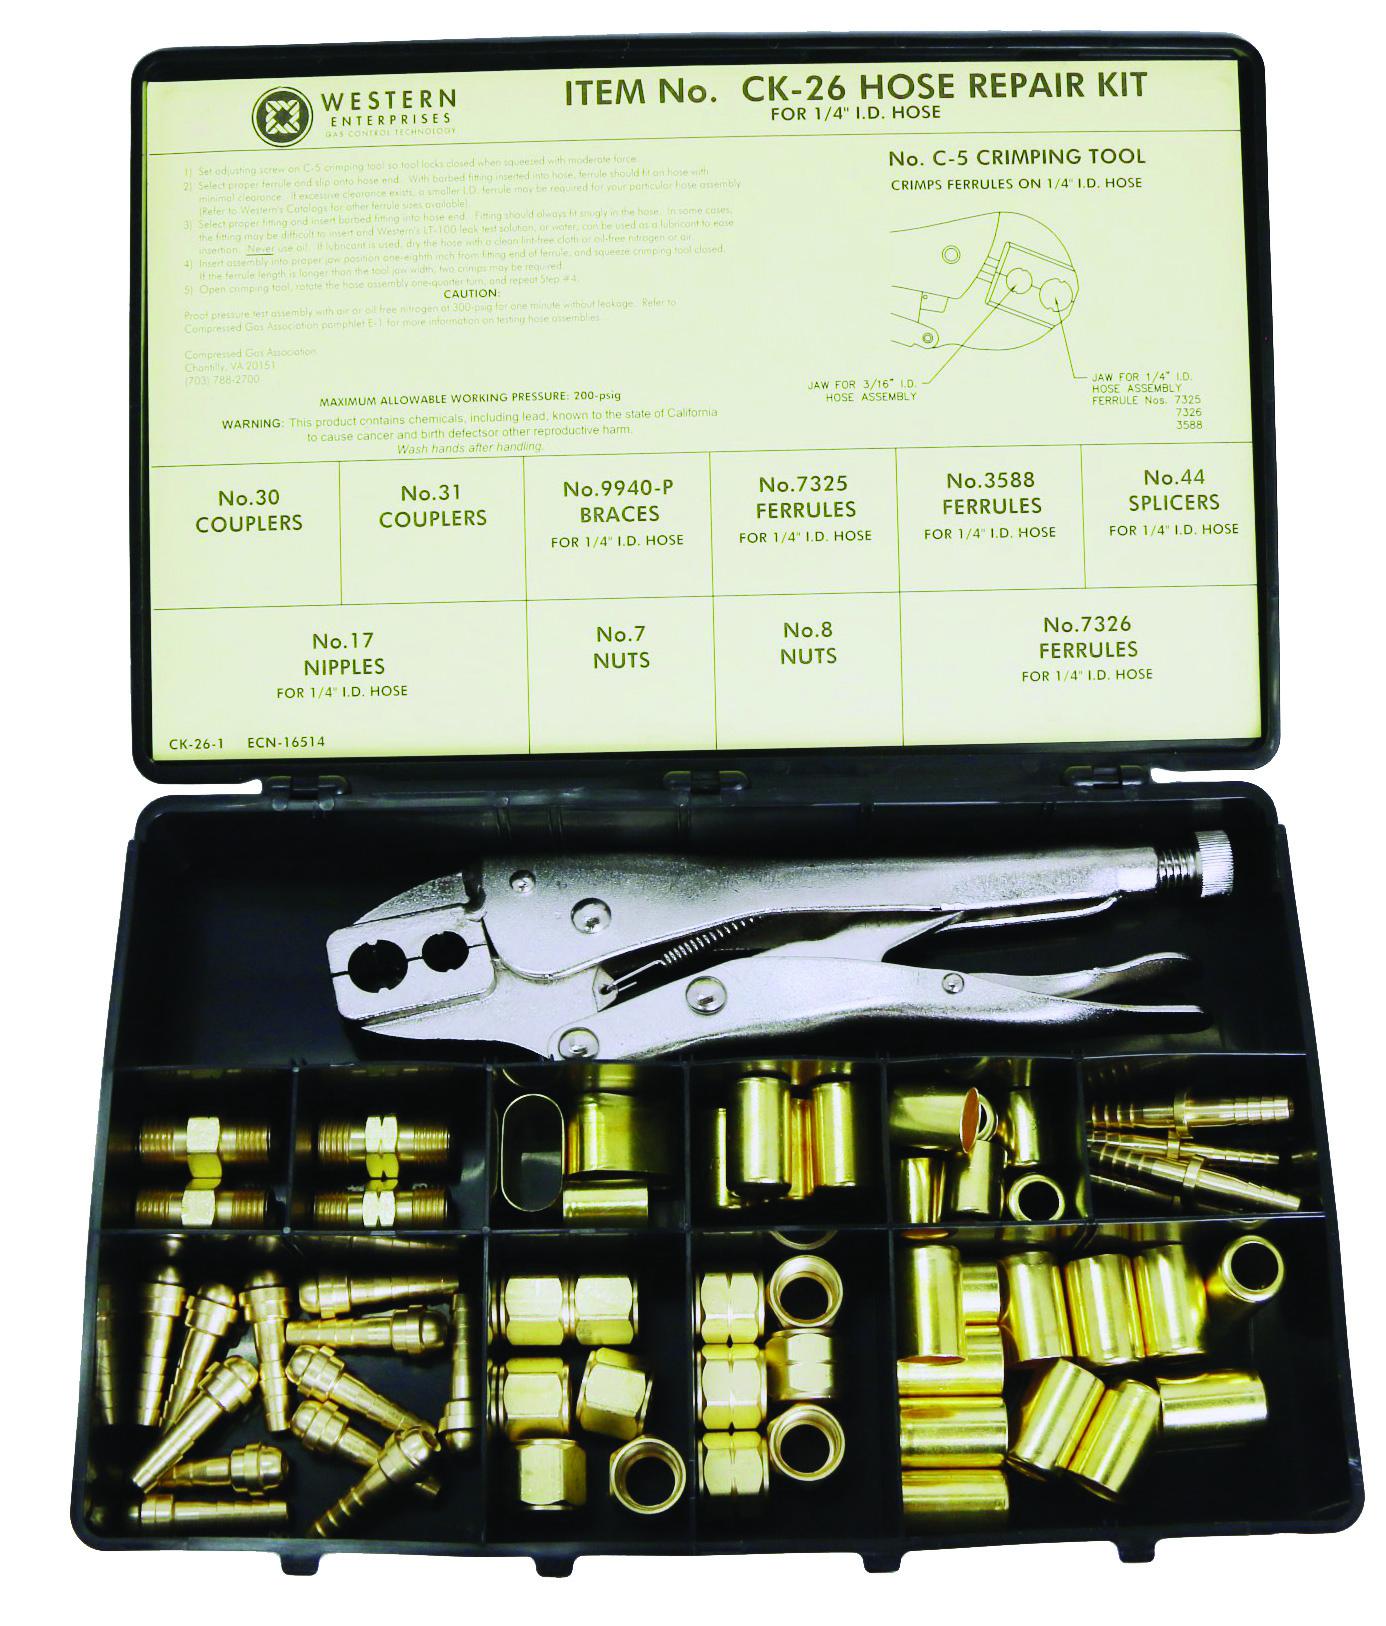 Ck Tools: Western Ck-26 Hose Repair Kit With C-5 Hand Grip Crimping